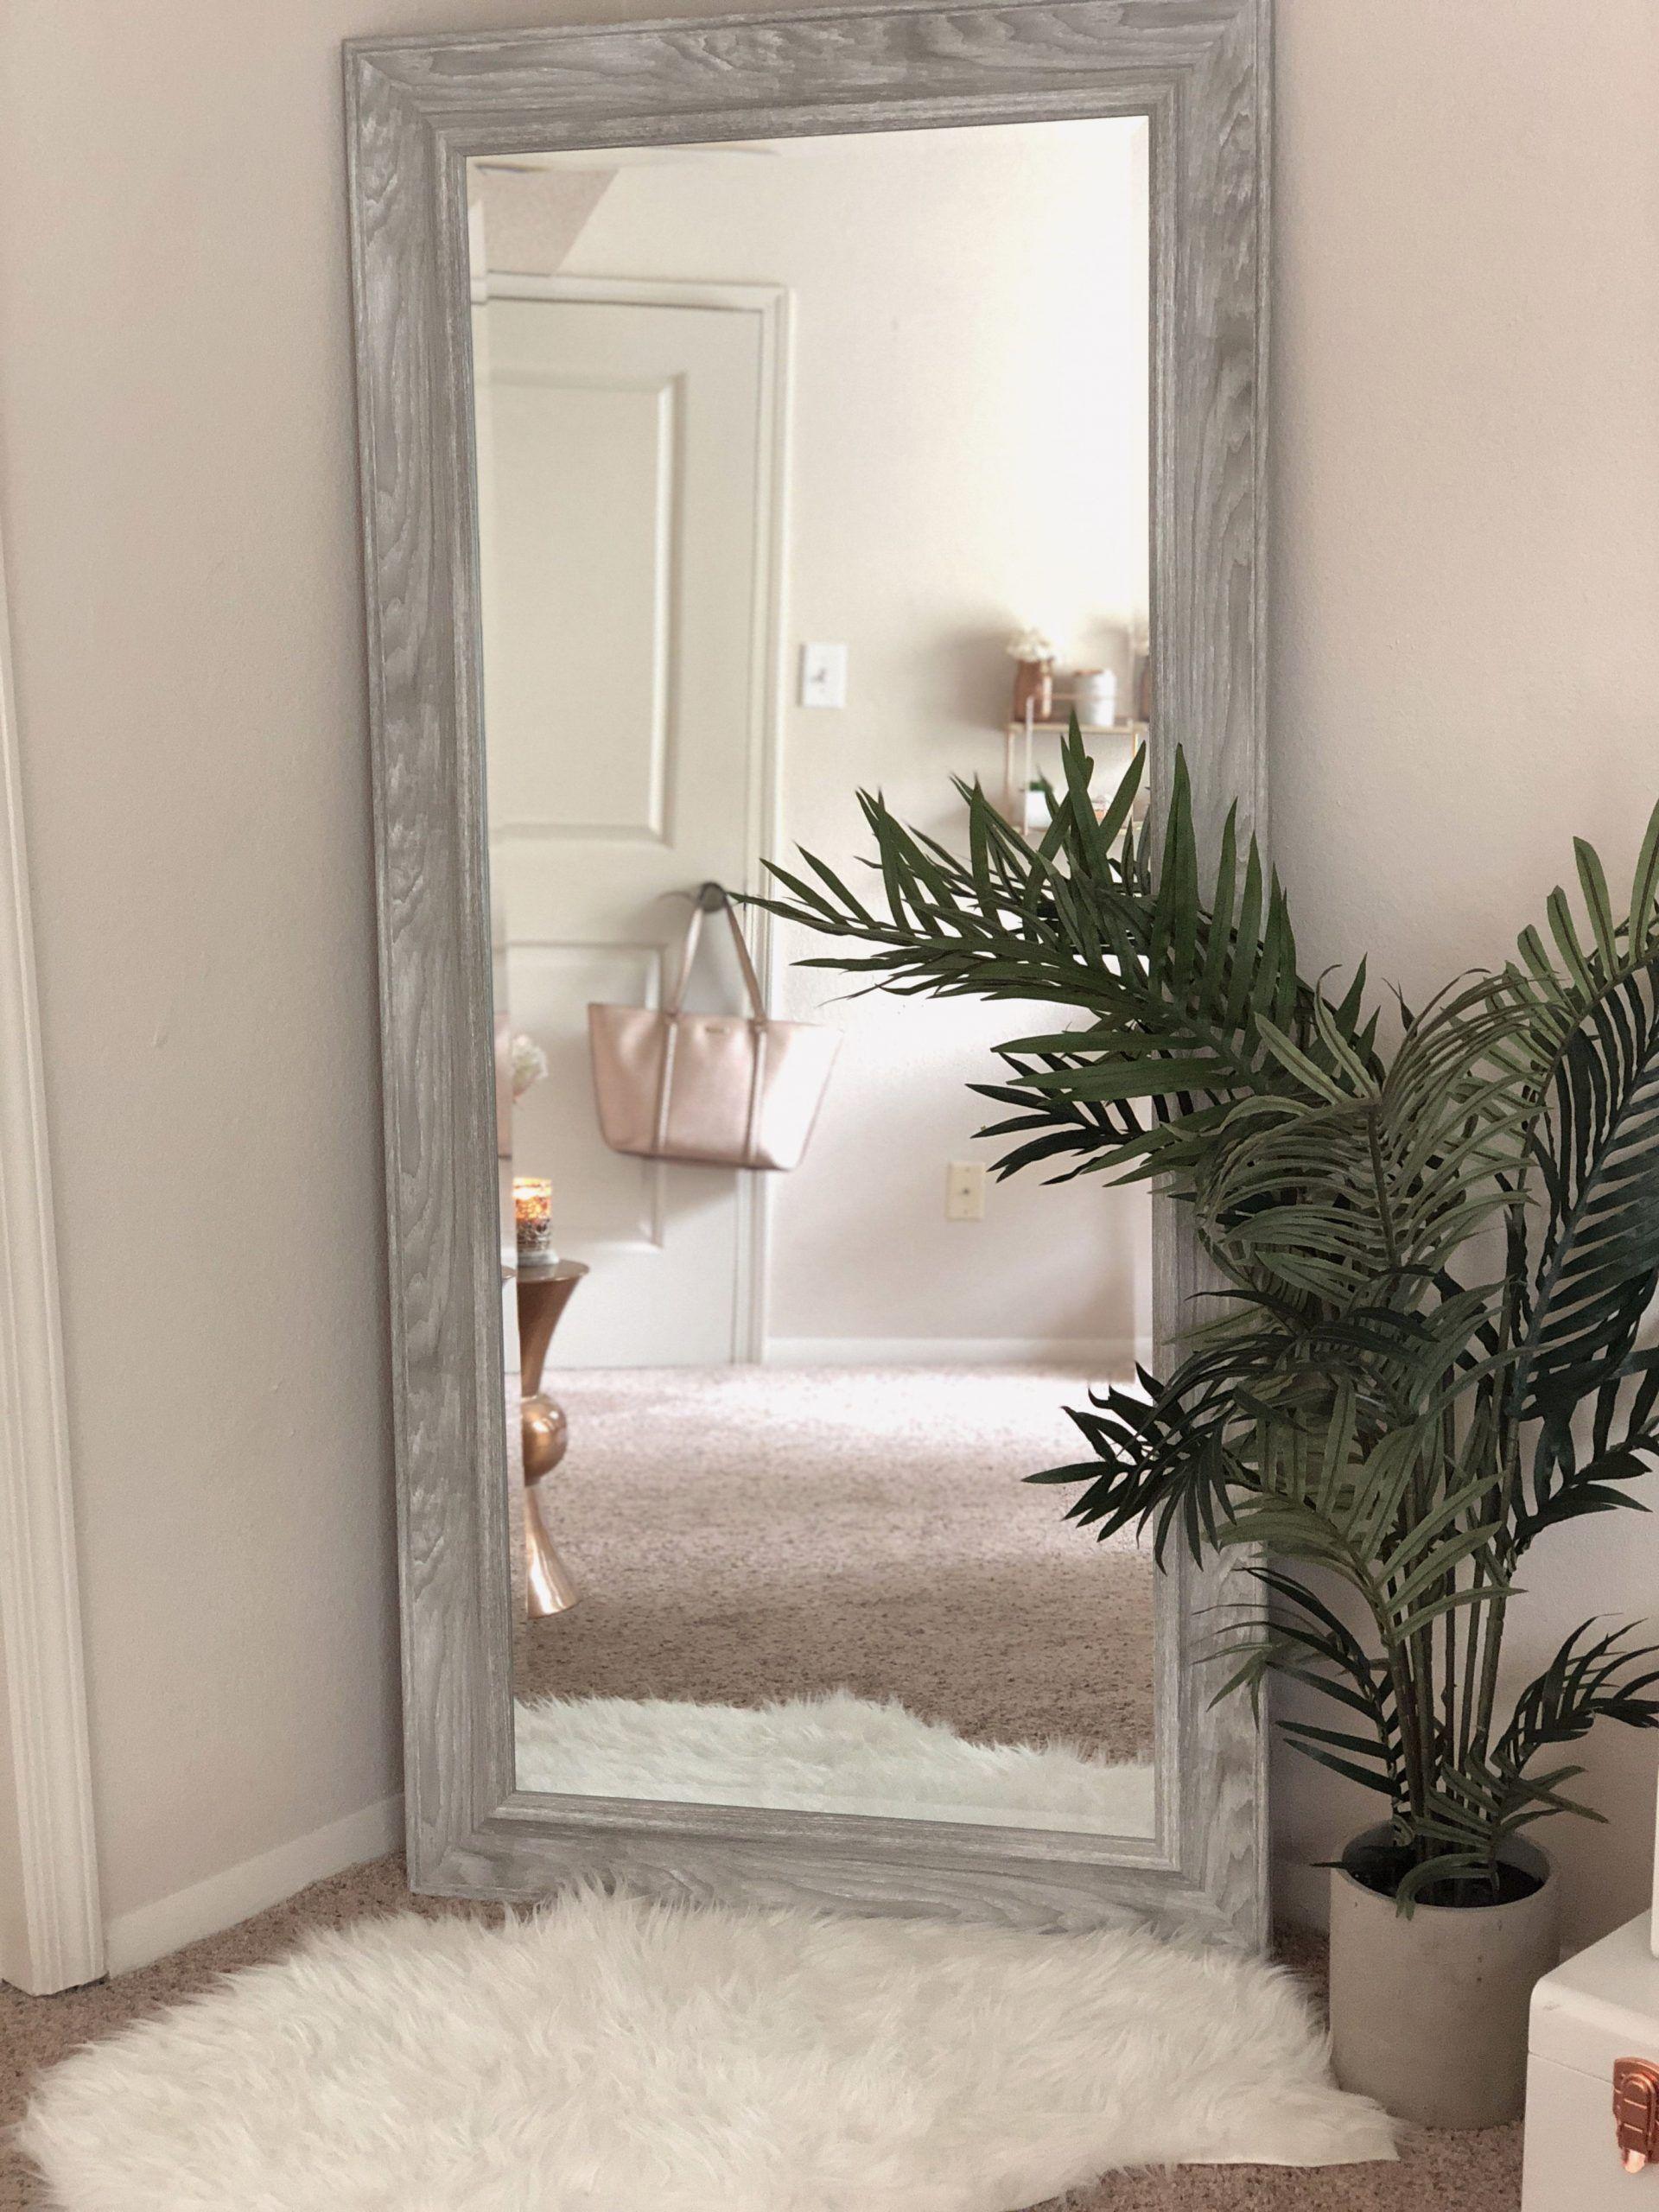 9 Floor Mirror In Living Room Ideas  Mirror wall bedroom, Wall